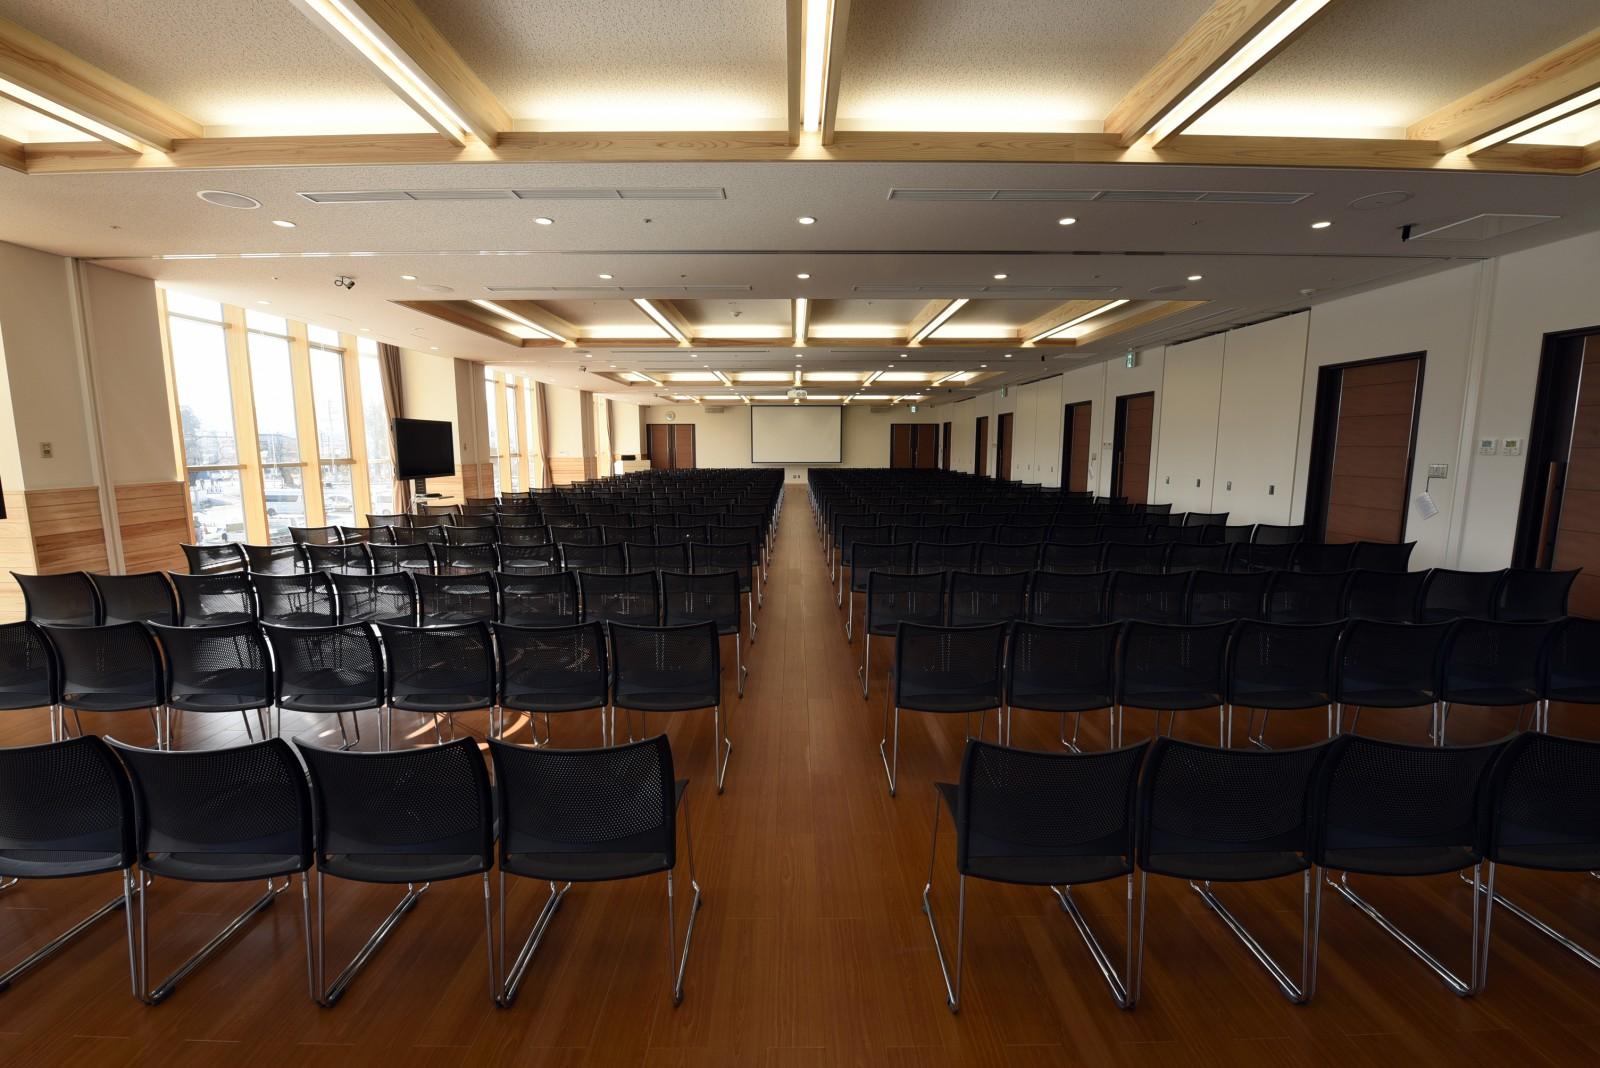 The Prince Chichibu Memorial Civic Hall